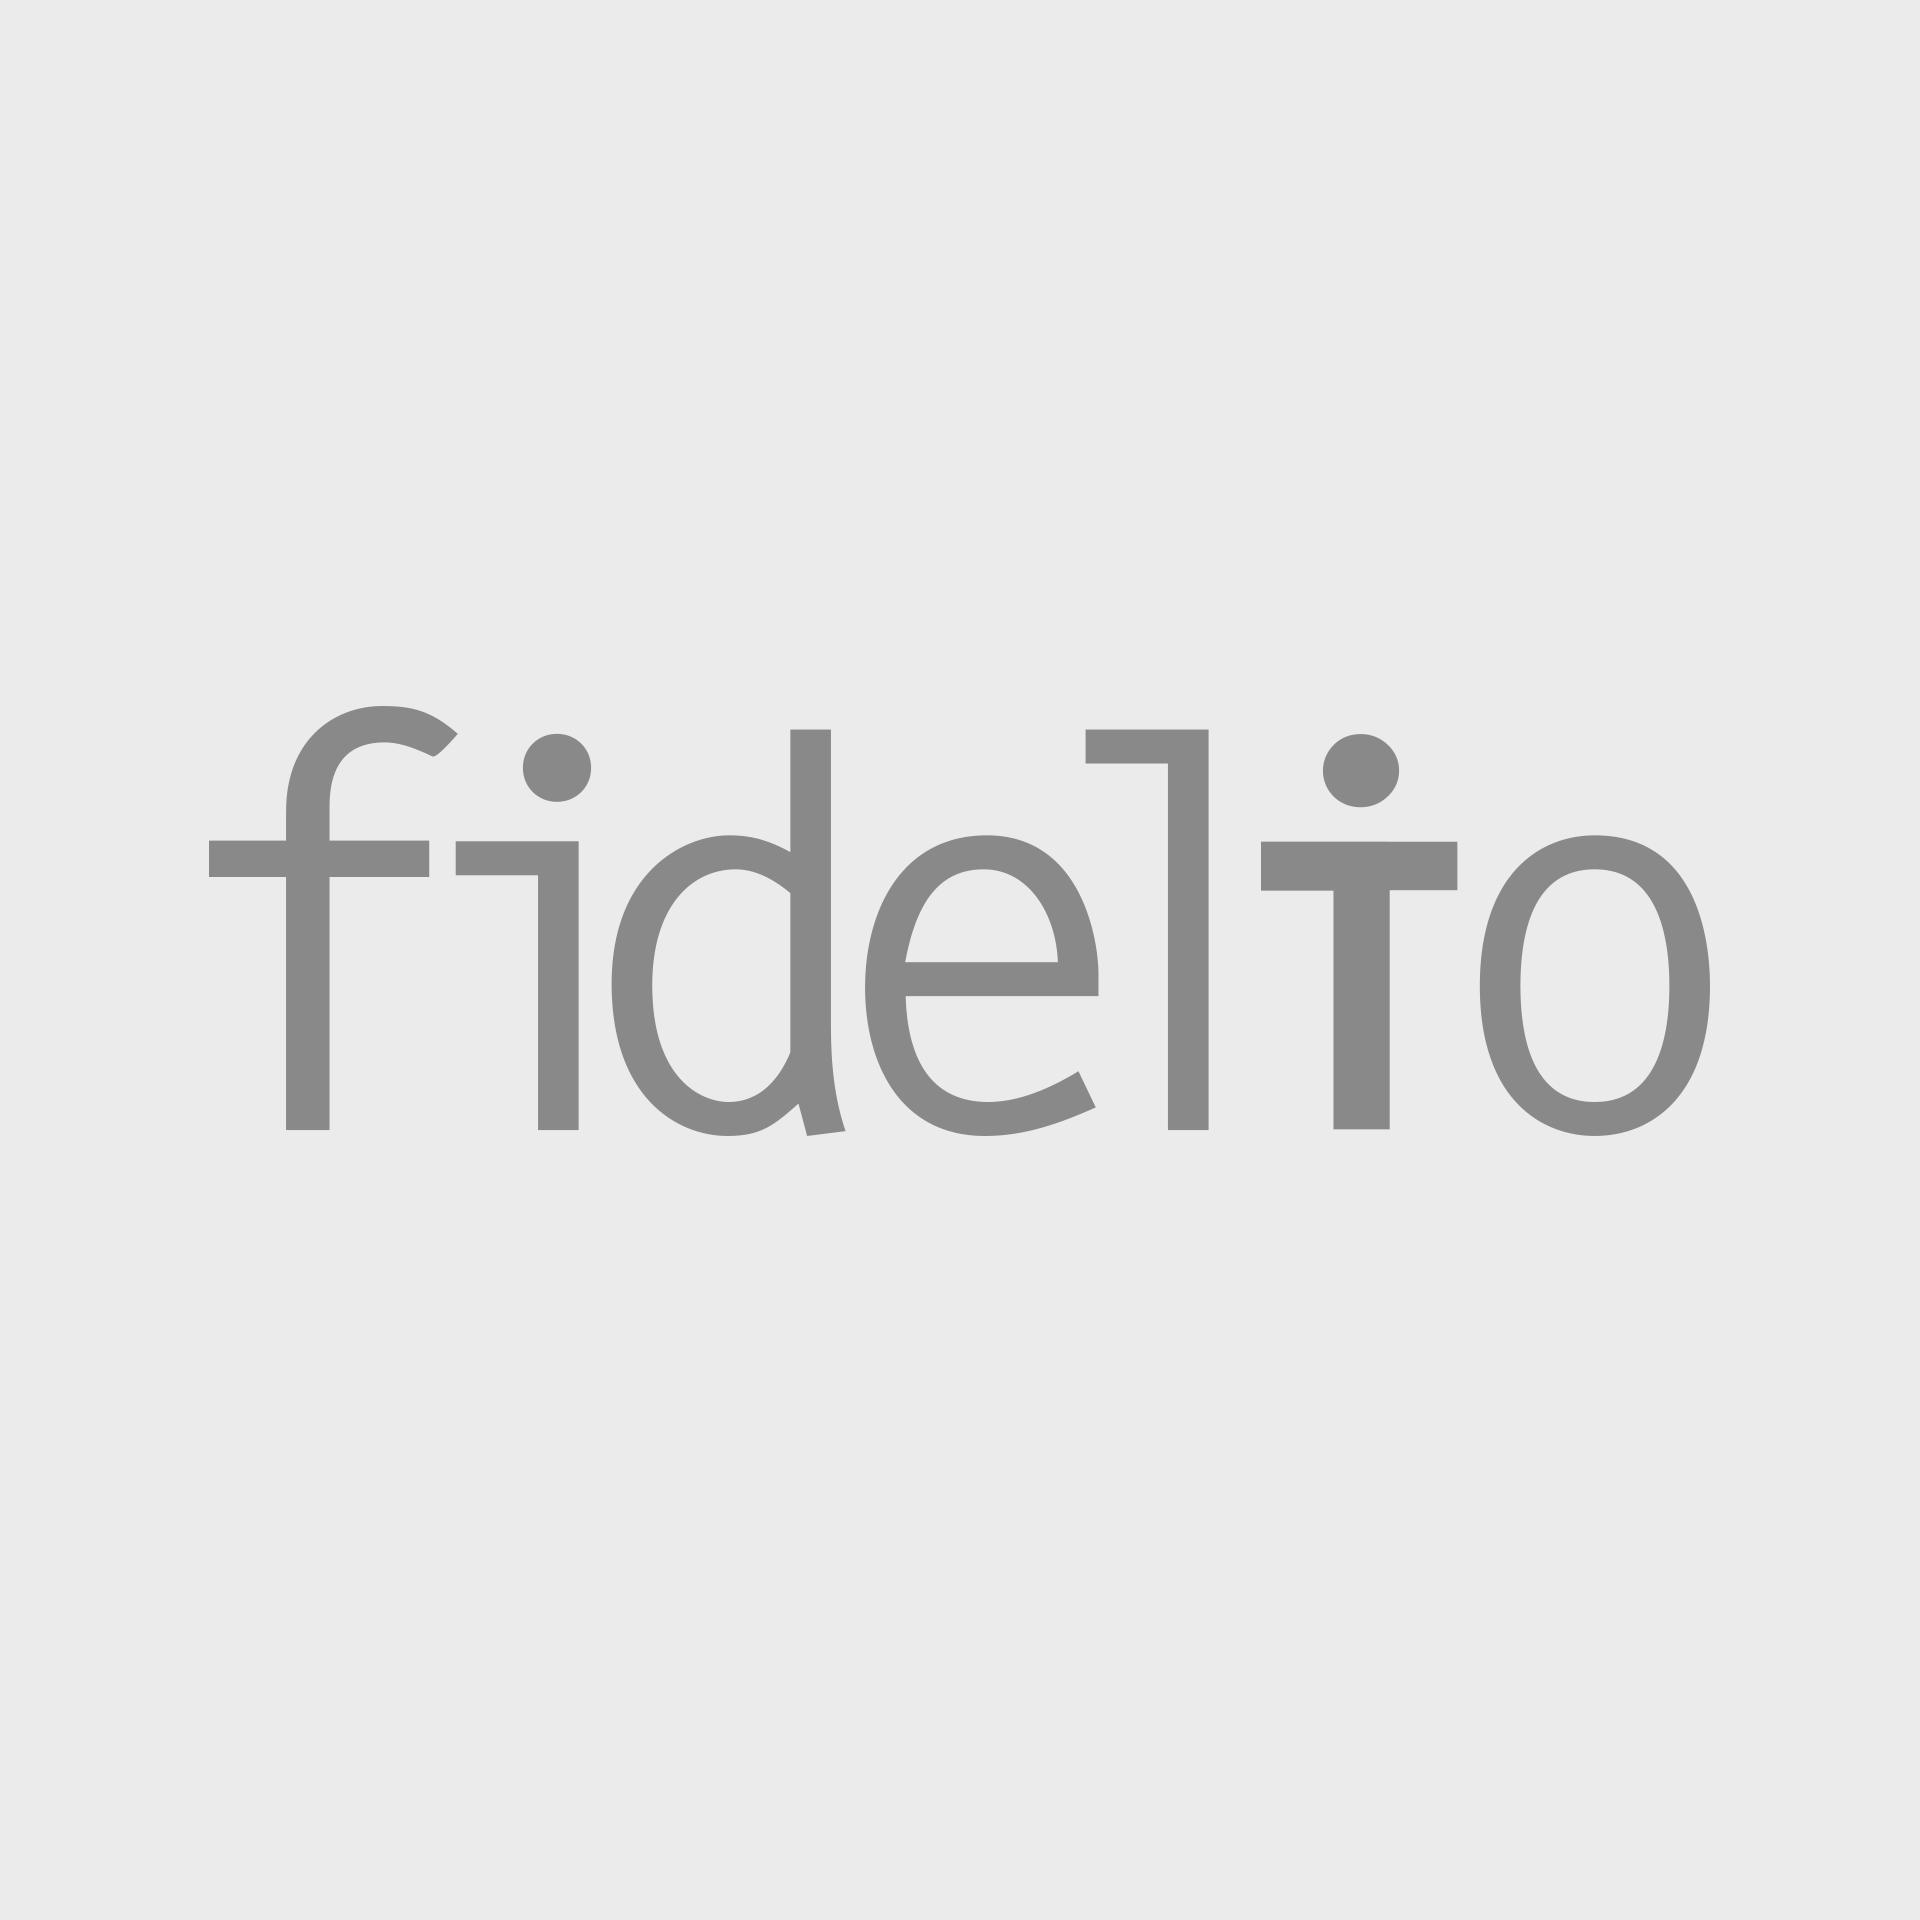 Fedak_eorifoto-5913-131901.jpg